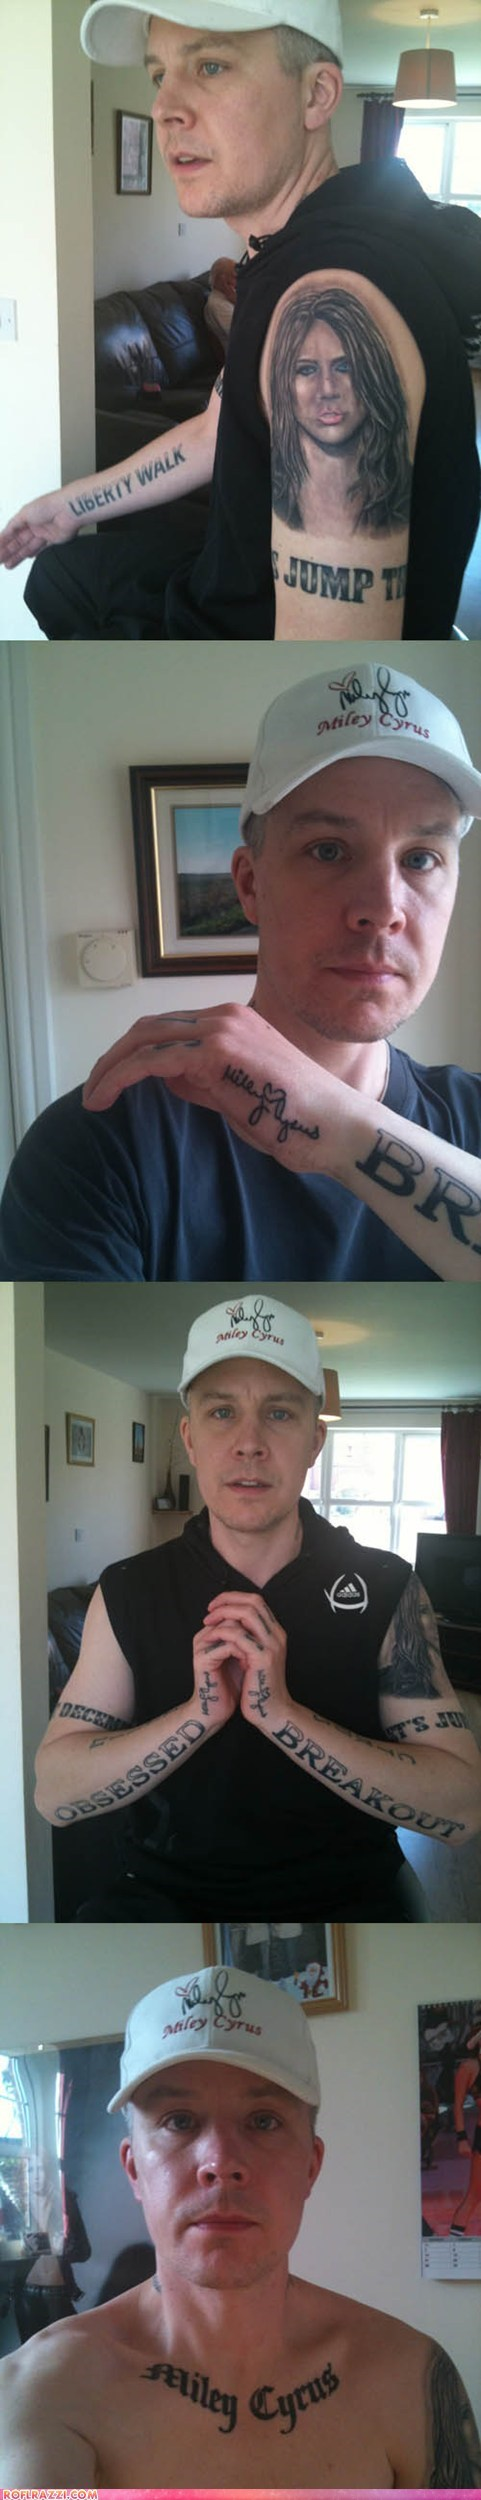 actor celeb creepy miley cyrus Music tattoo wtf - 6349386752